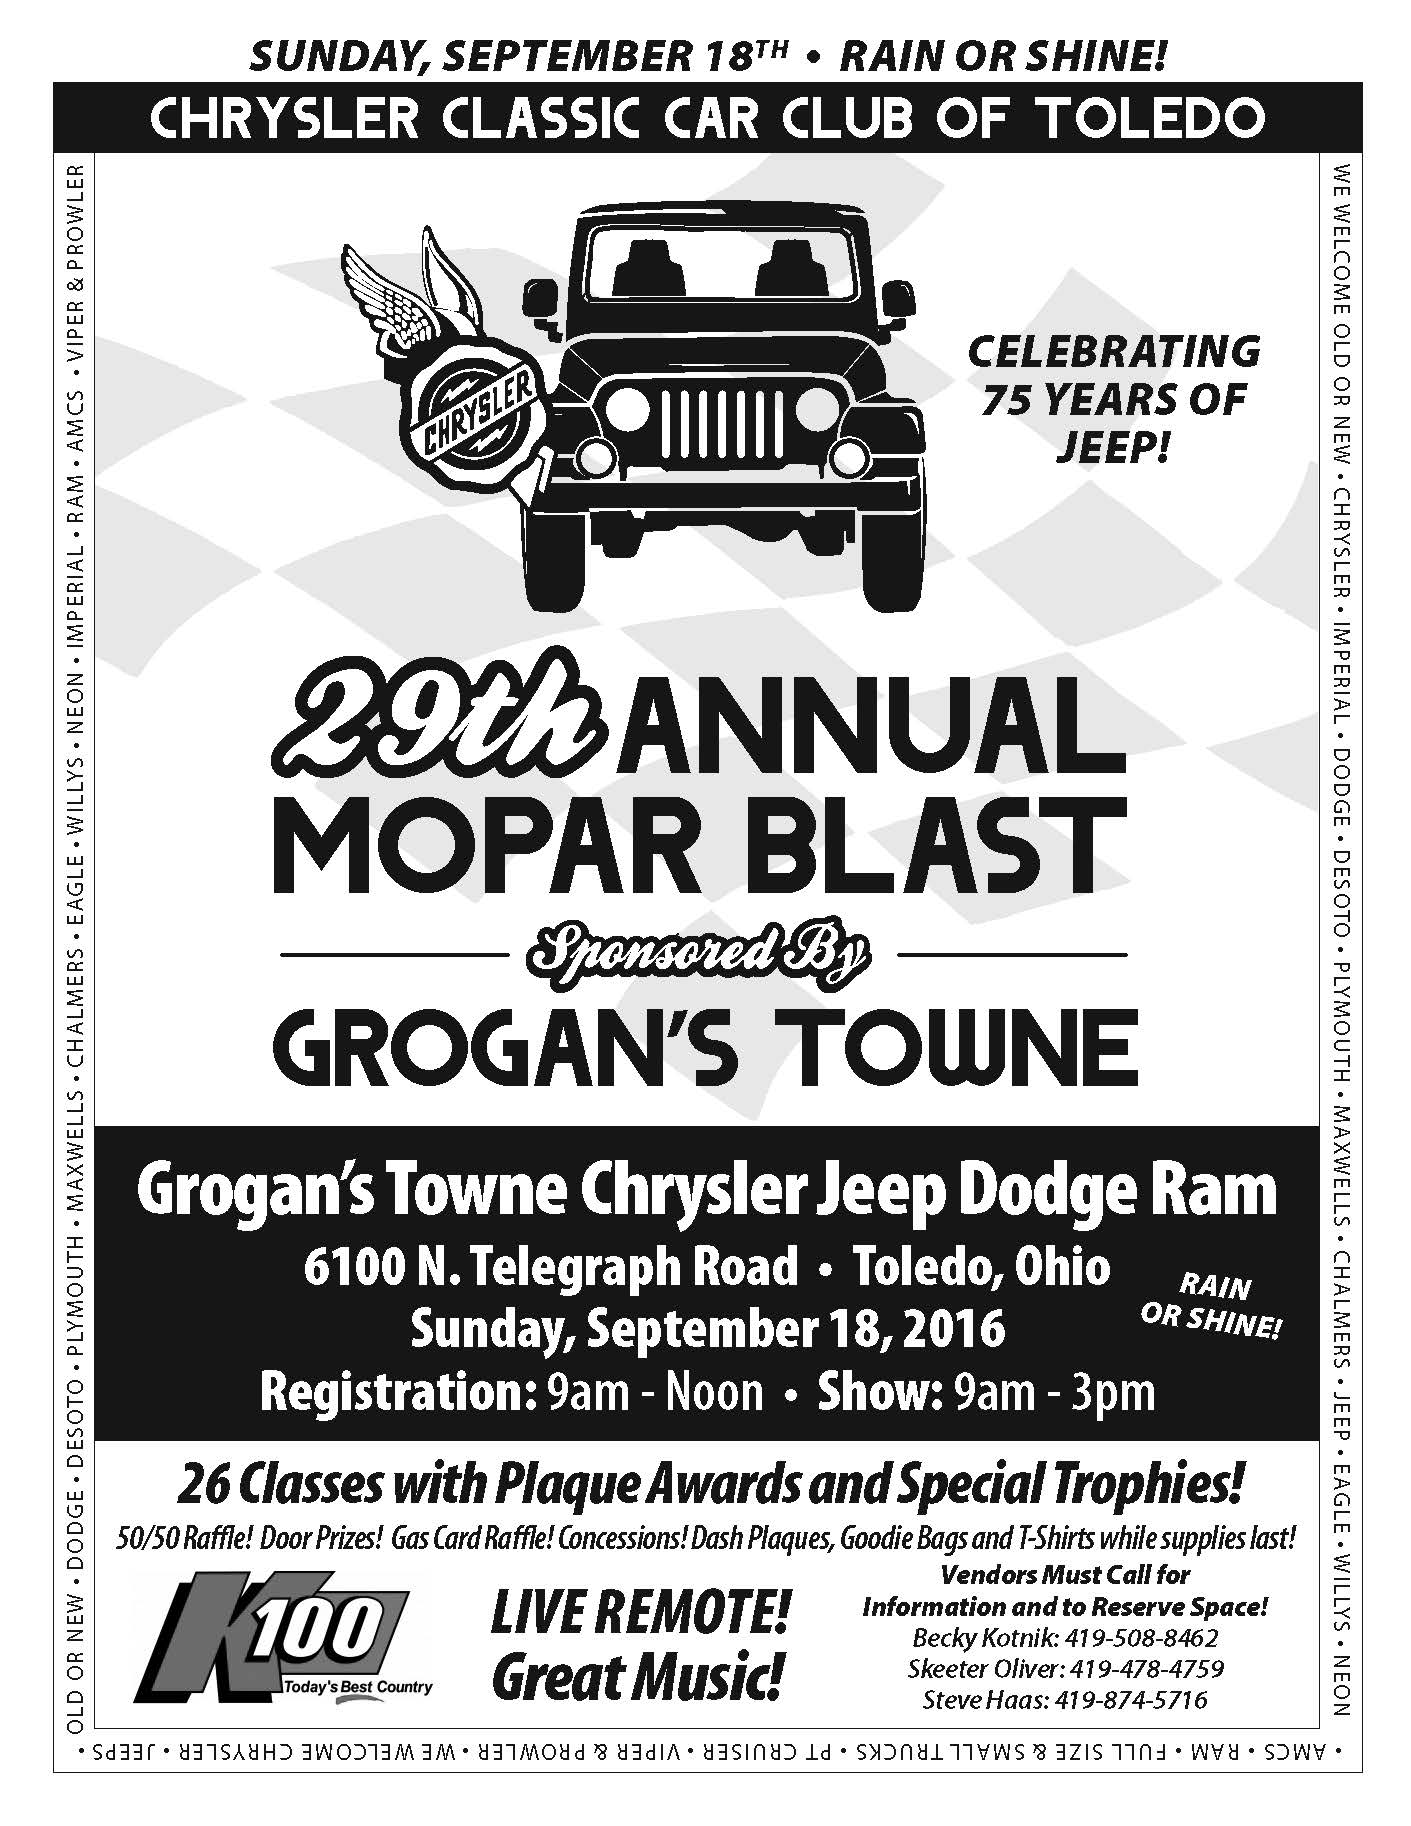 Grogan S Towne Chrysler Jeep Dodge Ram New Chrysler Dodge Jeep